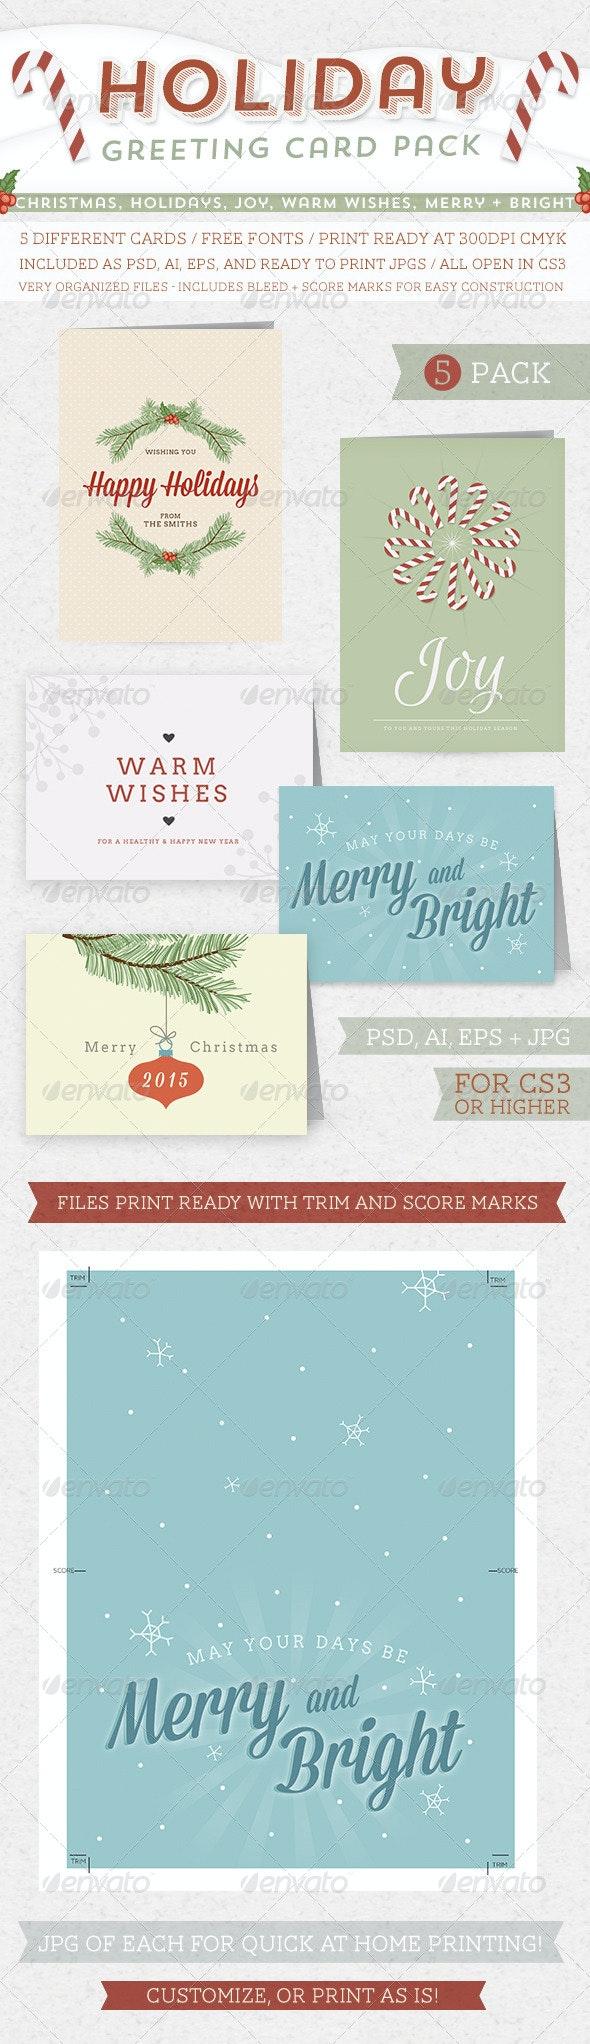 Holiday Greeting Card Pack - Holiday Greeting Cards